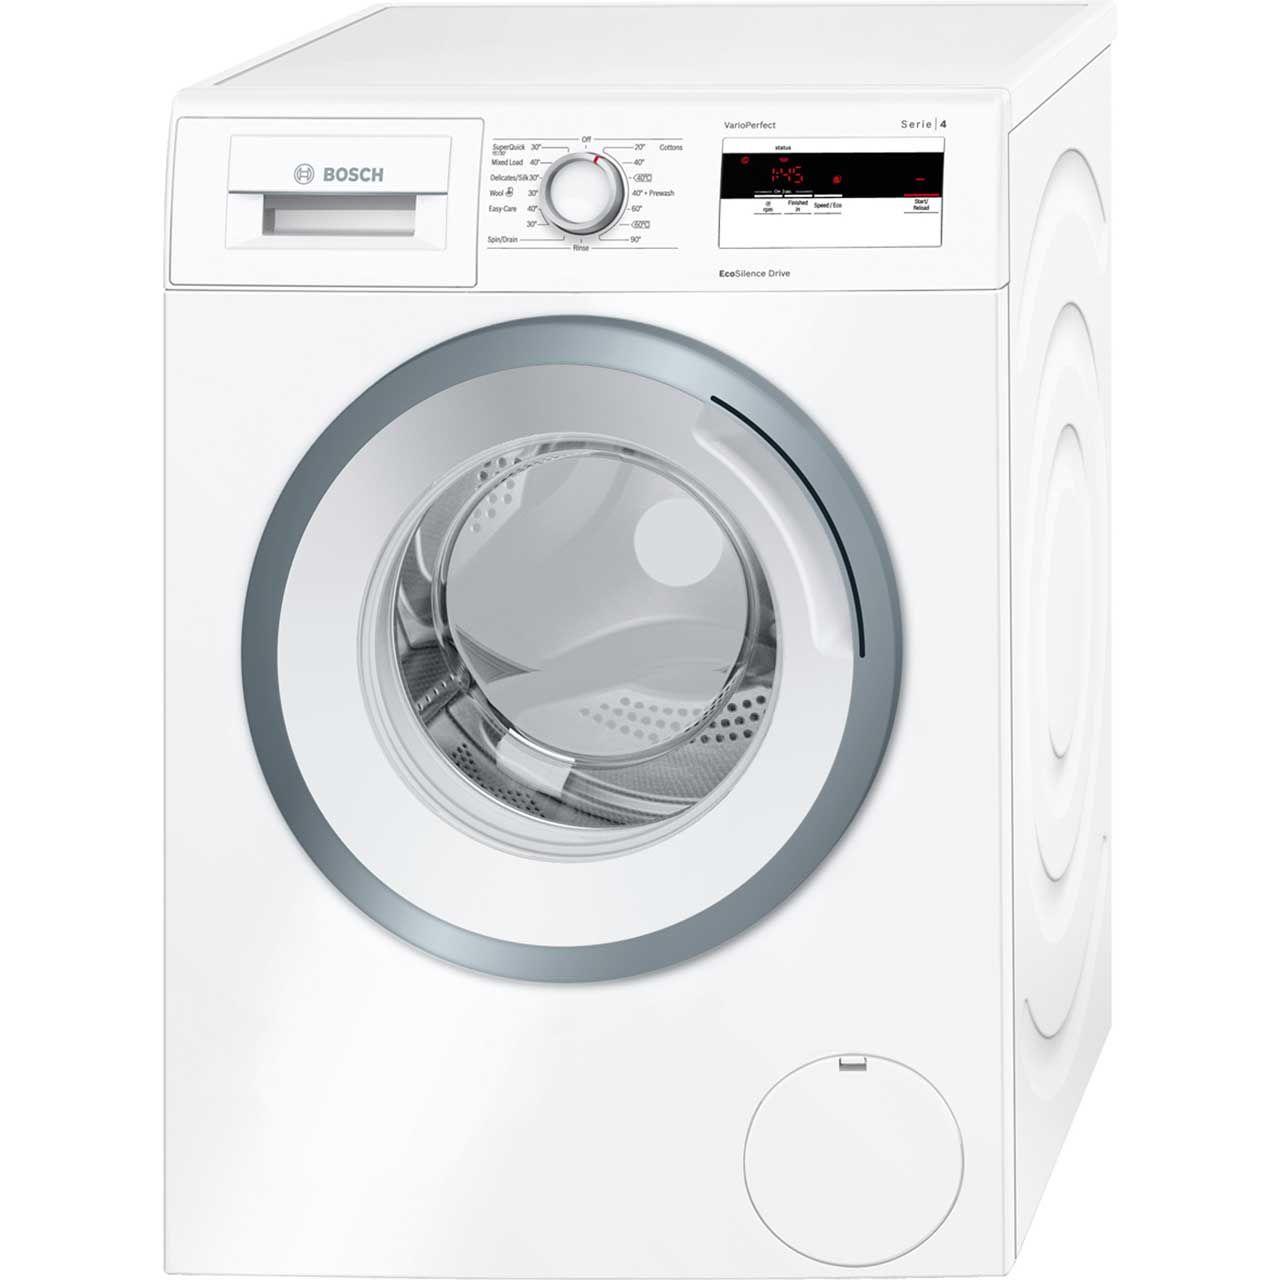 Bosch Serie 4 Wan28050gb 7kg Washing Machine With 1400 Rpm White A Rated Automatic Washing Machine Washing Machine Bosch Washing Machine